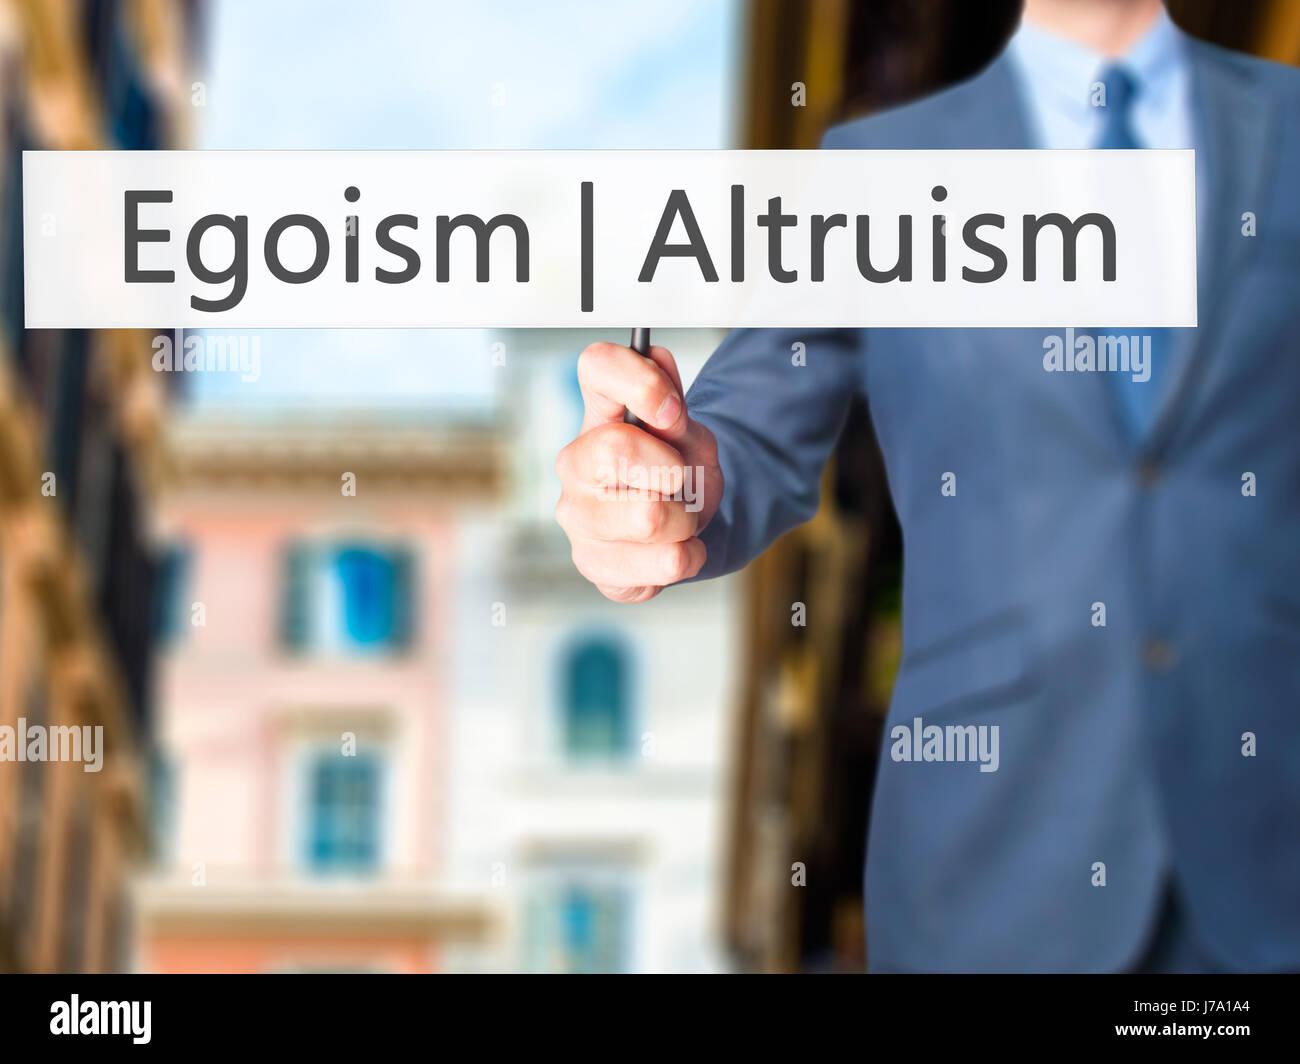 Altruism  Egoism - Businessman hand holding sign. Business, technology, internet concept. Stock Photo - Stock Image